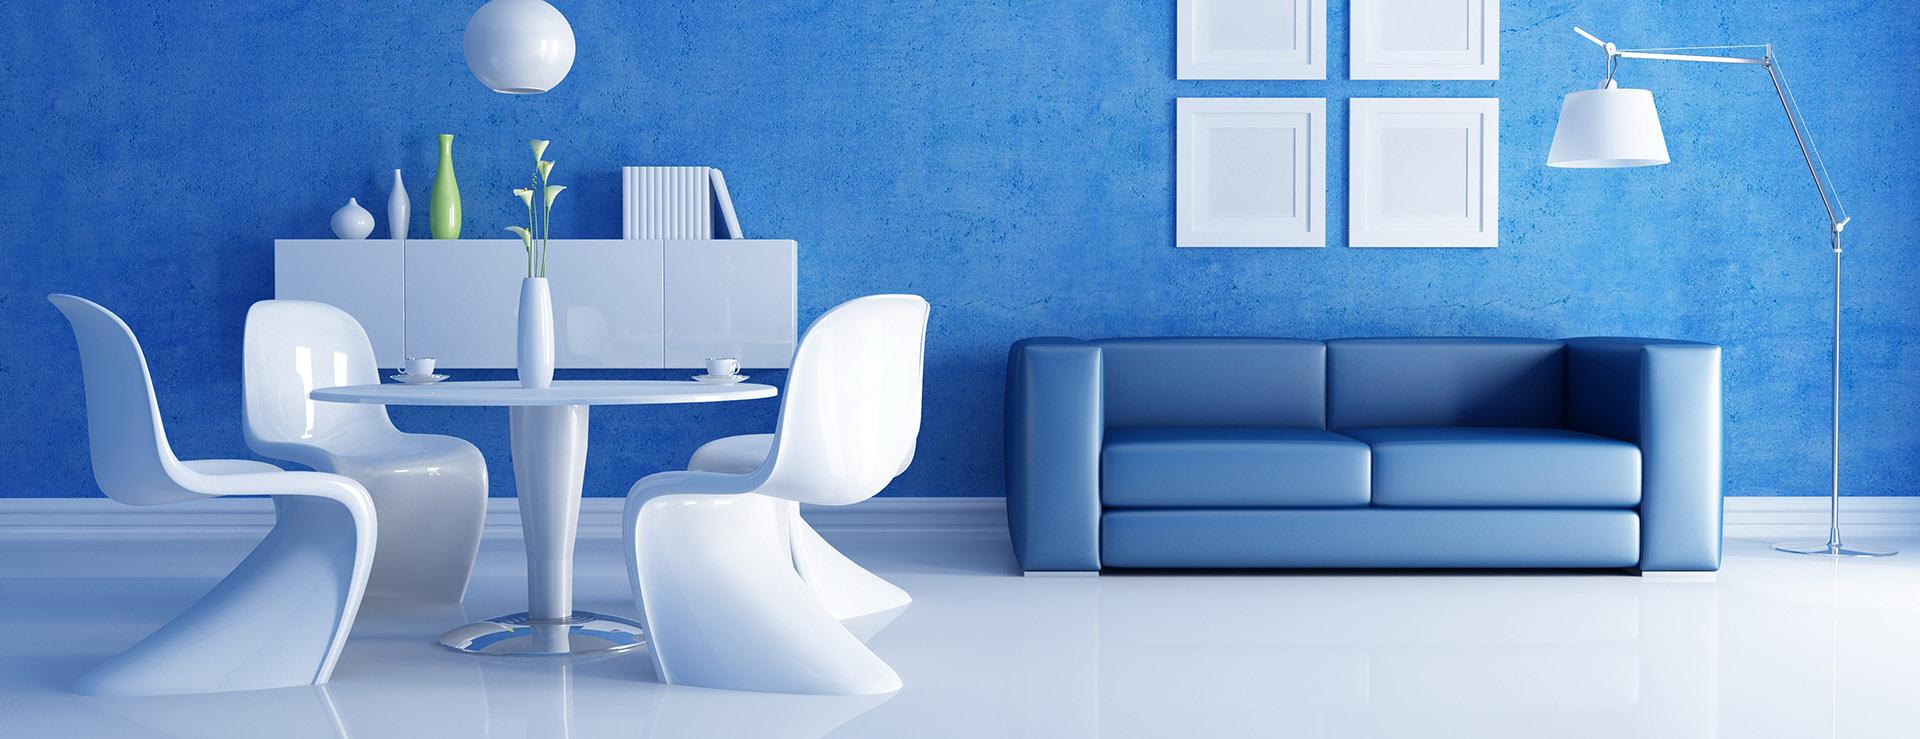 63852508 furniture wallpapers